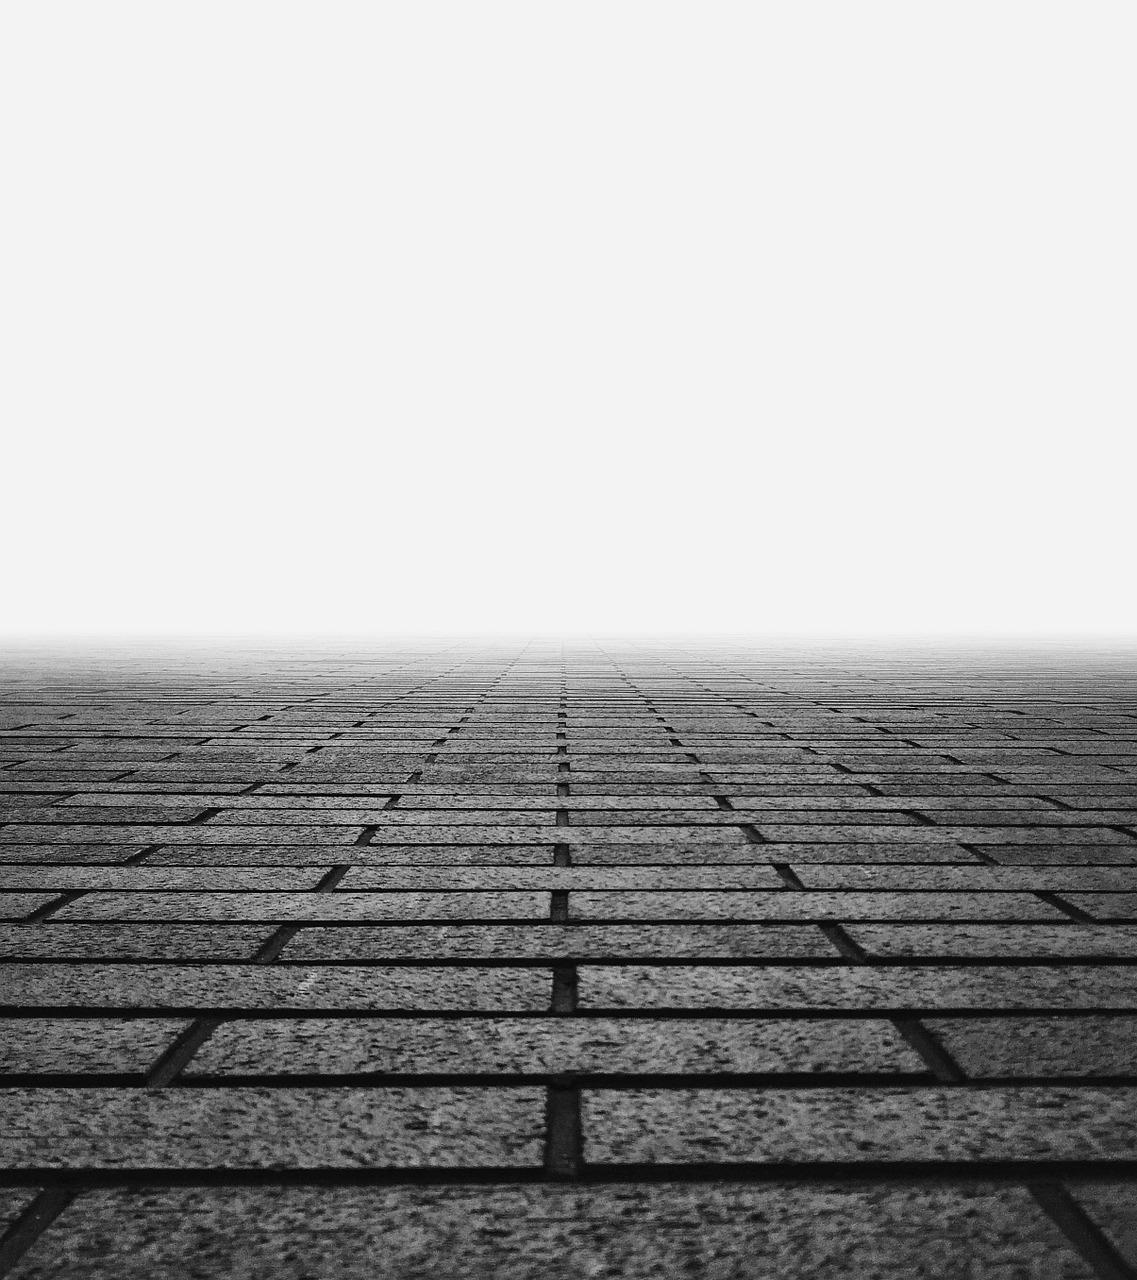 Source:https://pixabay.com/en/brick-wall-perspective-1030836/